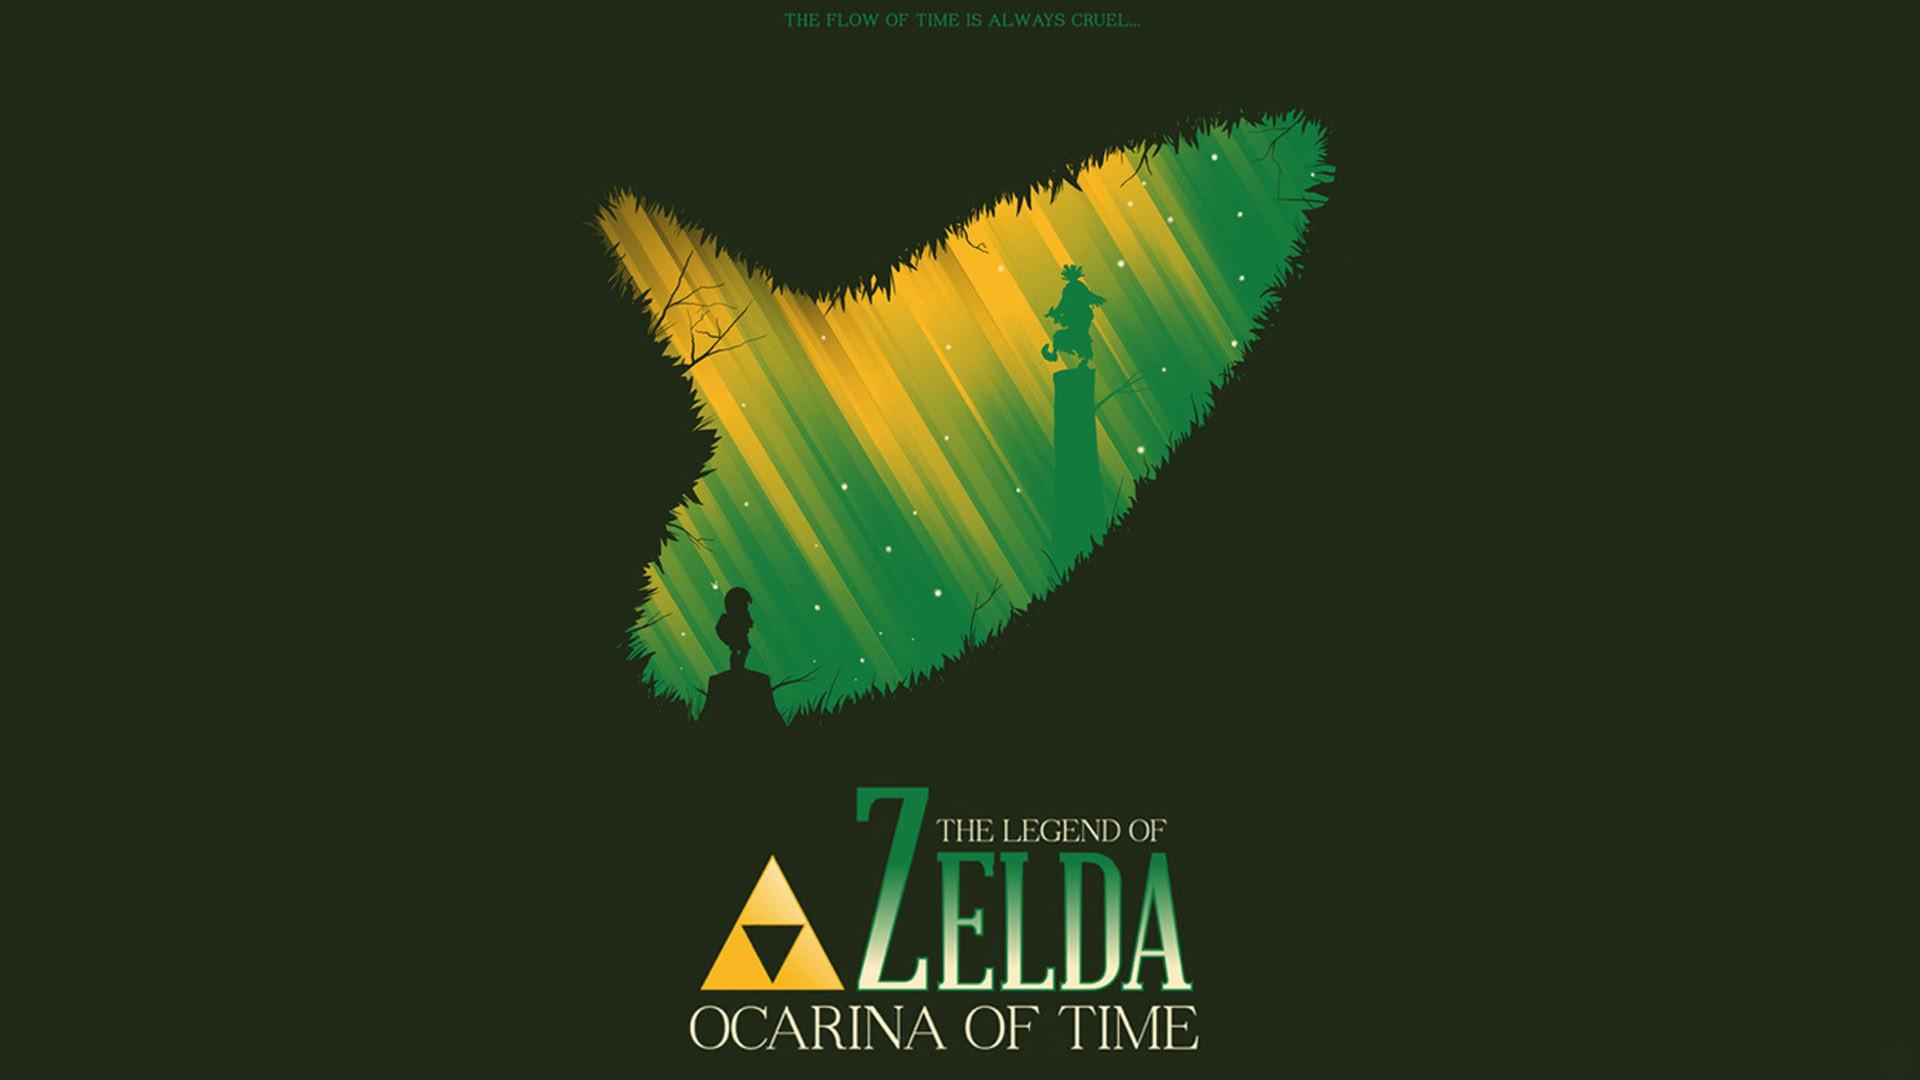 the legend of zelda: ocarina of time hd wallpaper   background image